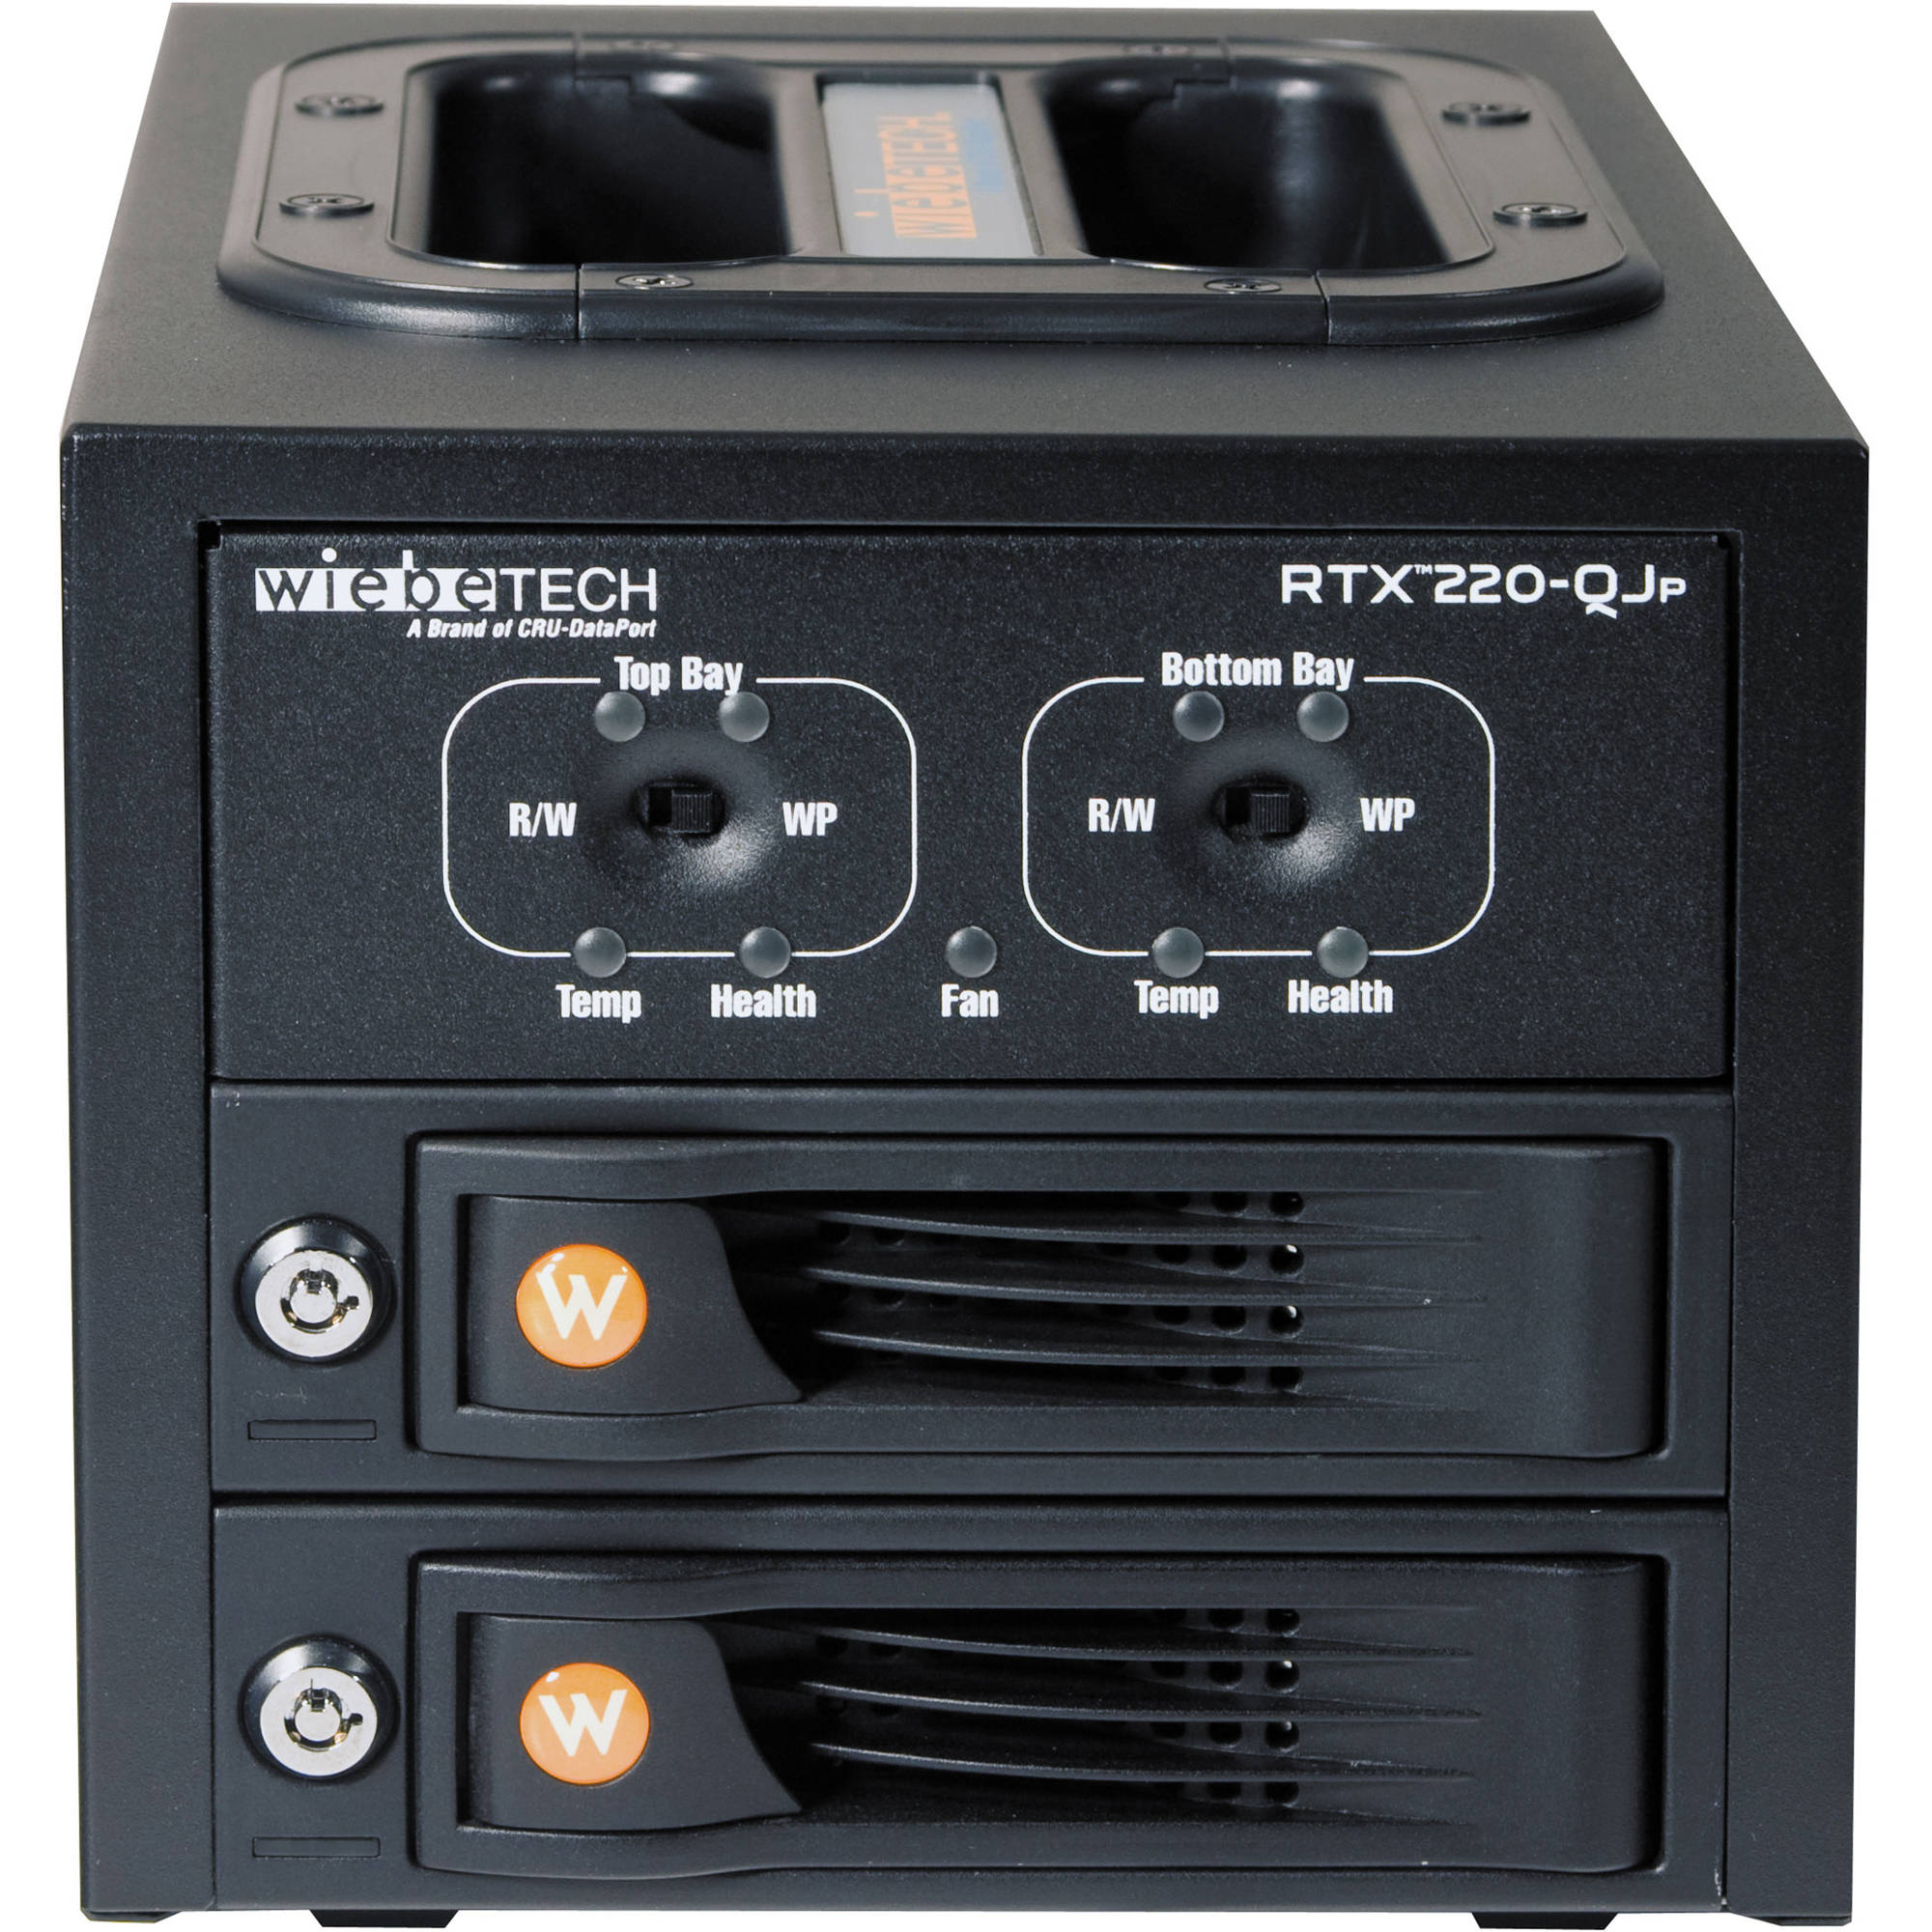 CRU-DataPort RTX220-QJP 2 TrayFree SATA Hard 35220-2530-0001 B\u0026H